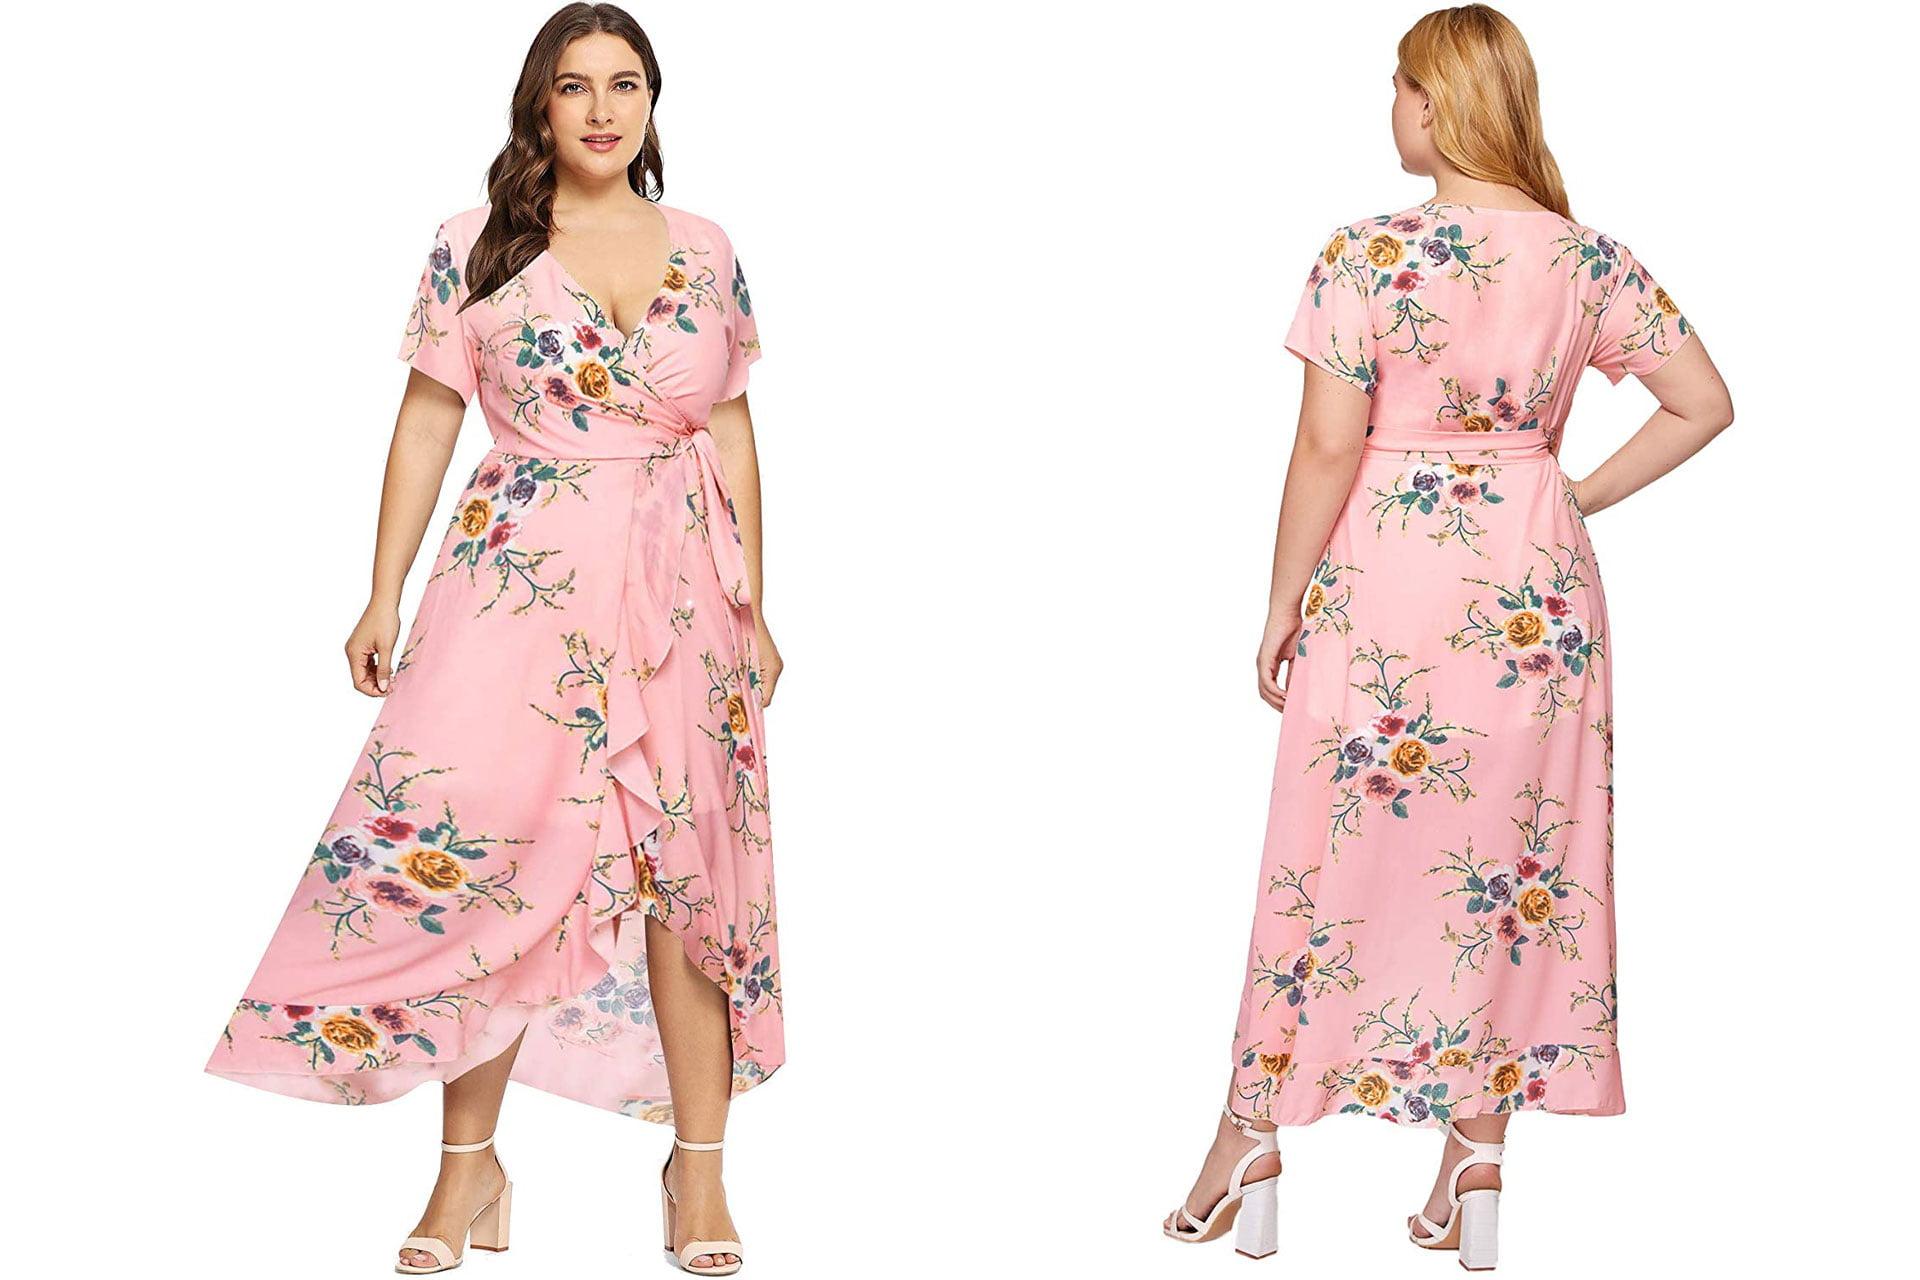 Milumia Empire Waist Asymmetrical High Low Bohemian Maxi Dress